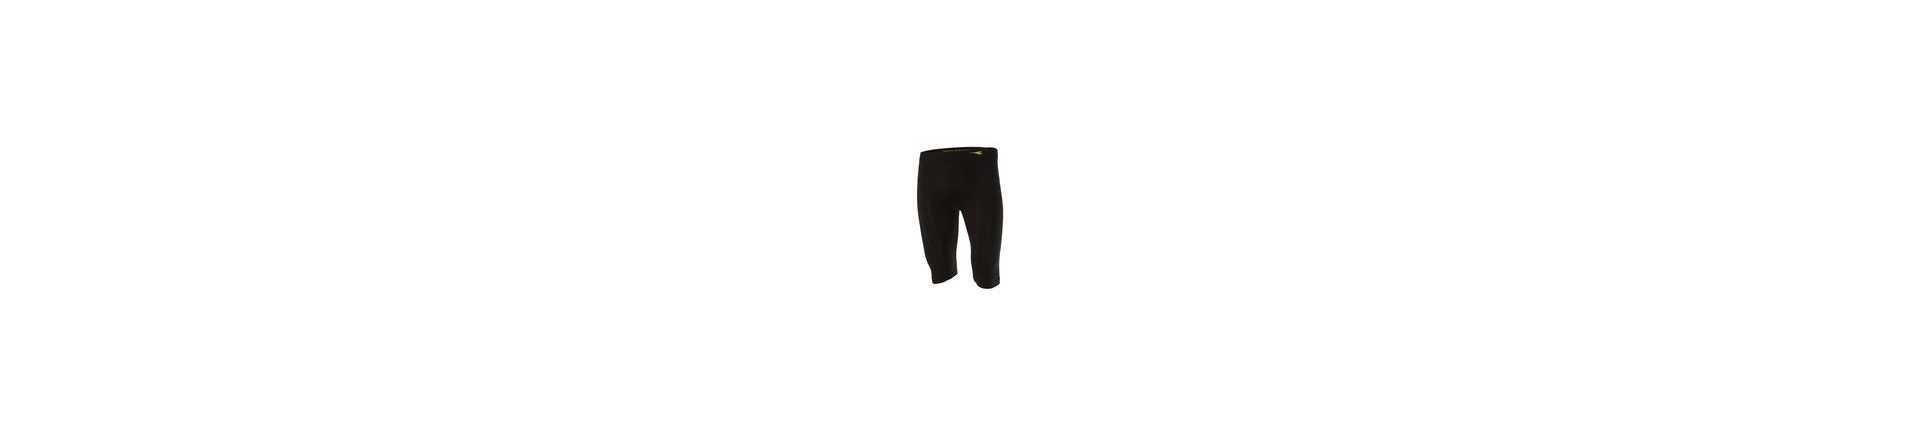 Pantaloni Diadora Hidden Power